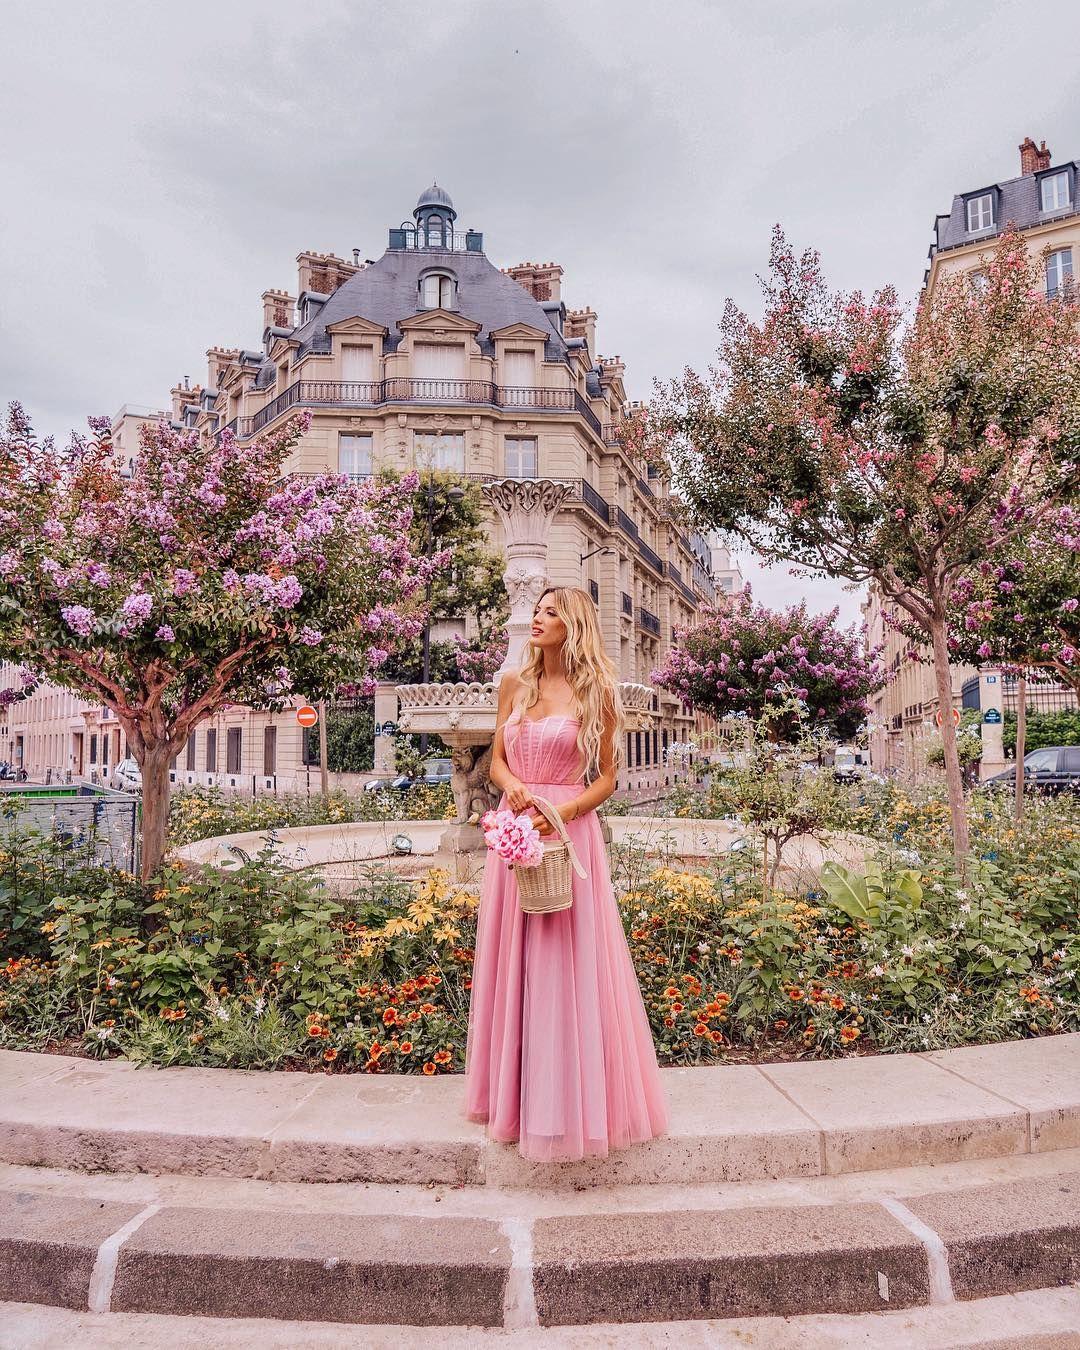 Pink dress emoji  Pin by Lineth Gonzalez on Blush Fairy  Pinterest  Emoji and Instagram